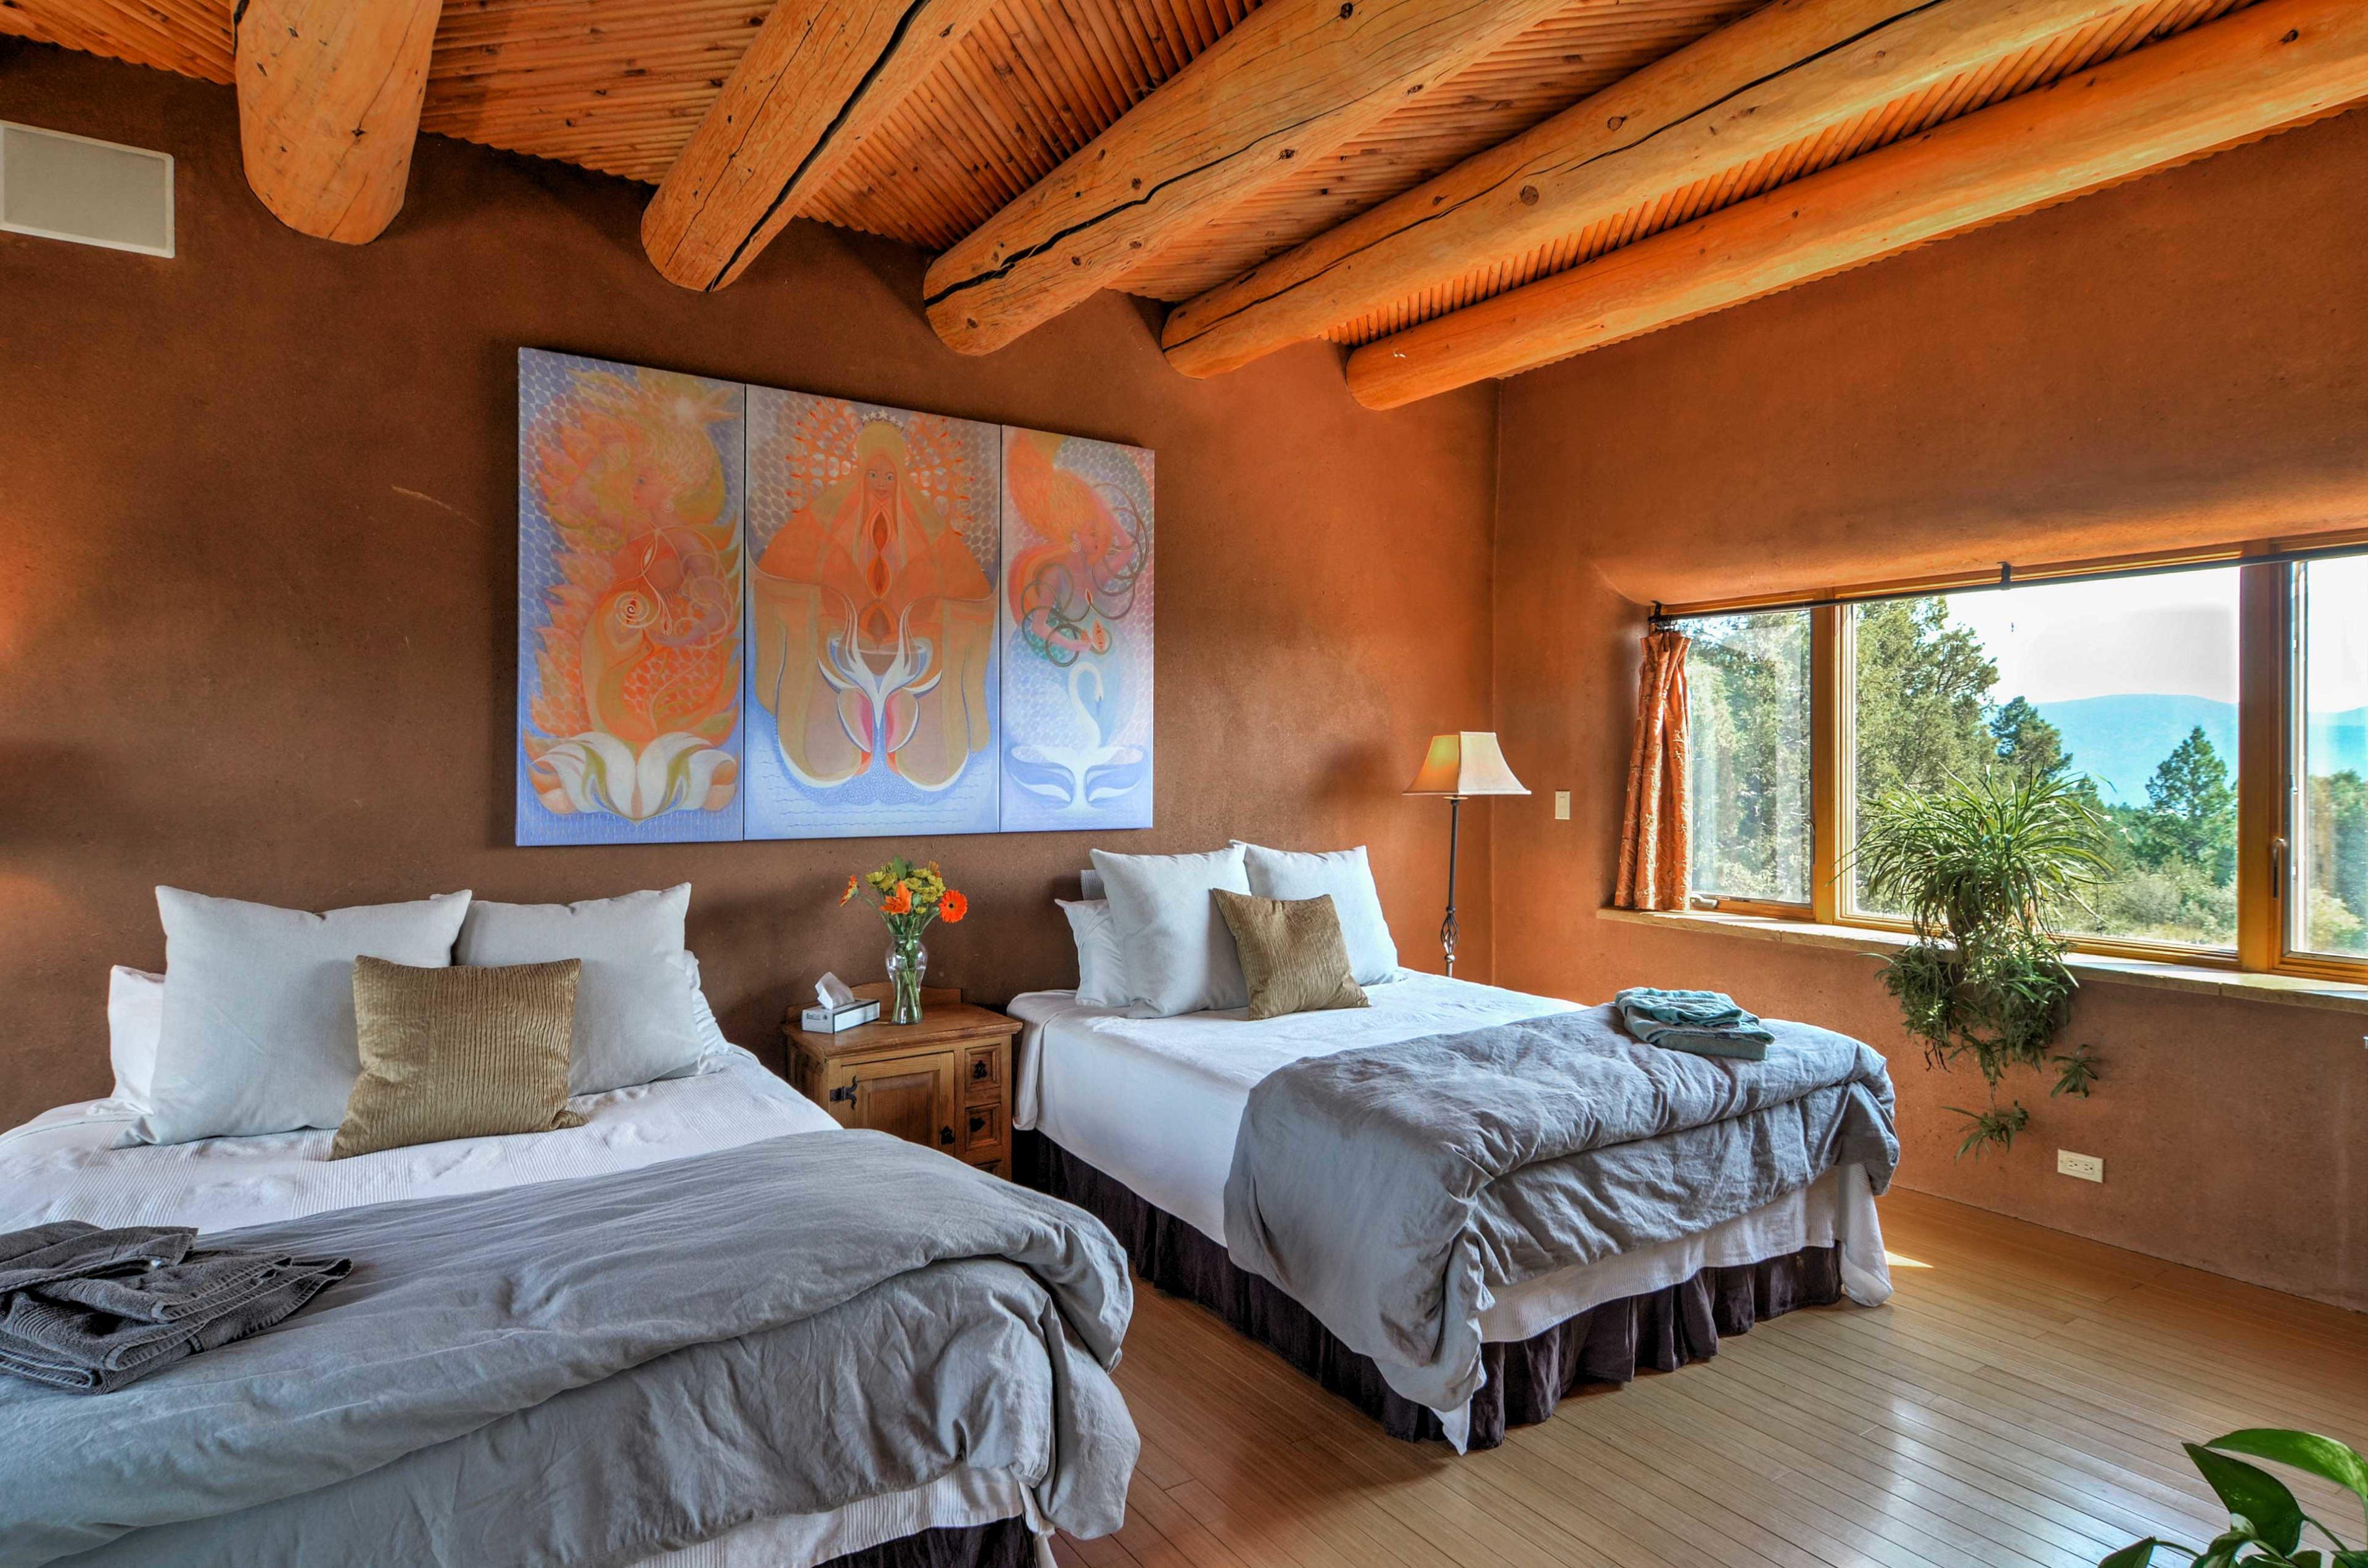 The Golden Eagle Suite features 2 queen beds.